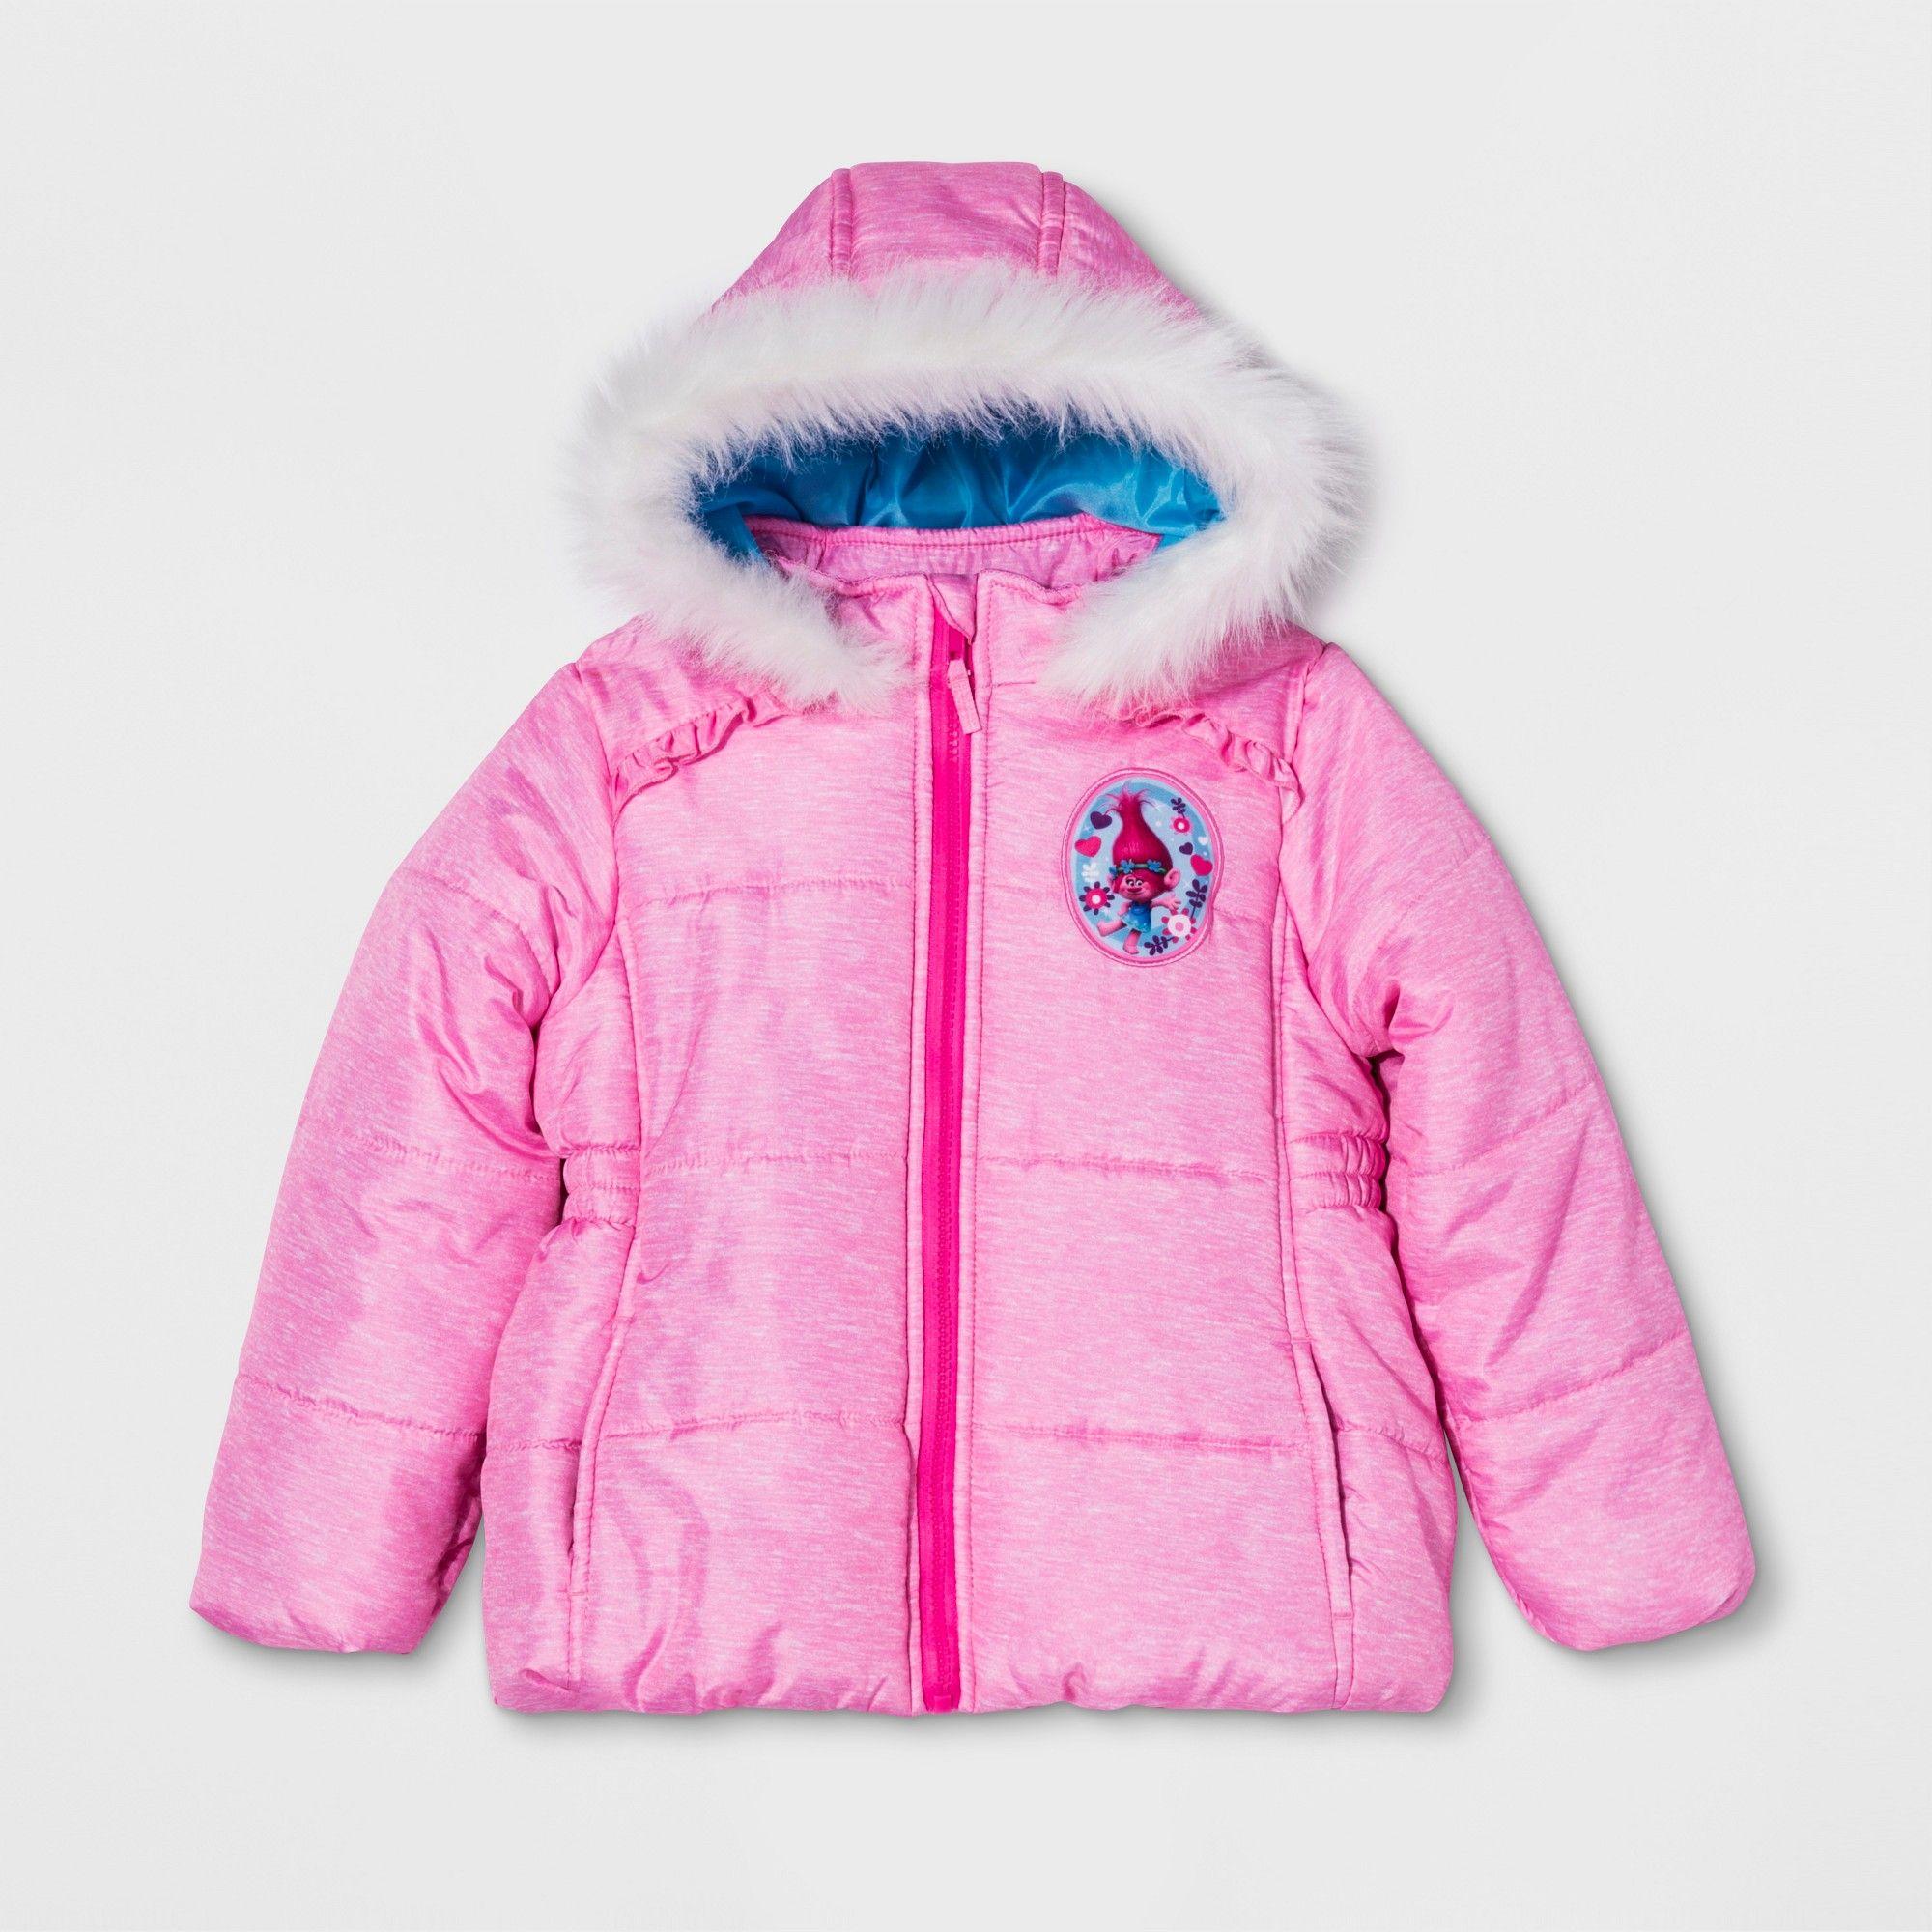 4ee9e6ddc Girls' Trolls Puffer Jacket - Pink 6X | Products | Puffer jackets ...